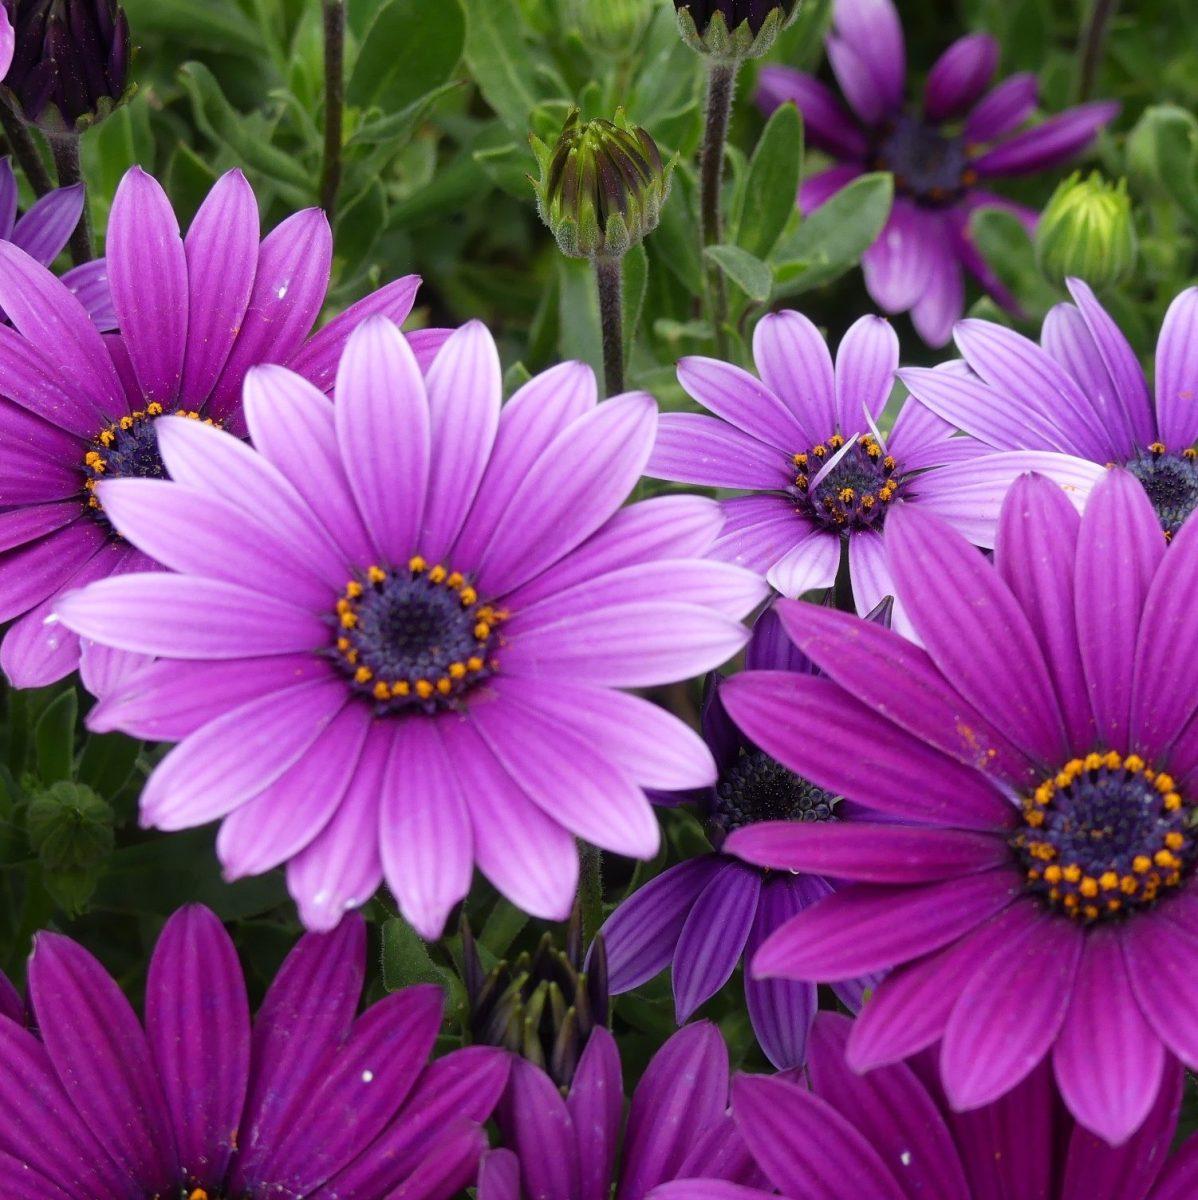 Sunday Stills Monthly Color Challenge: Views in #Violet